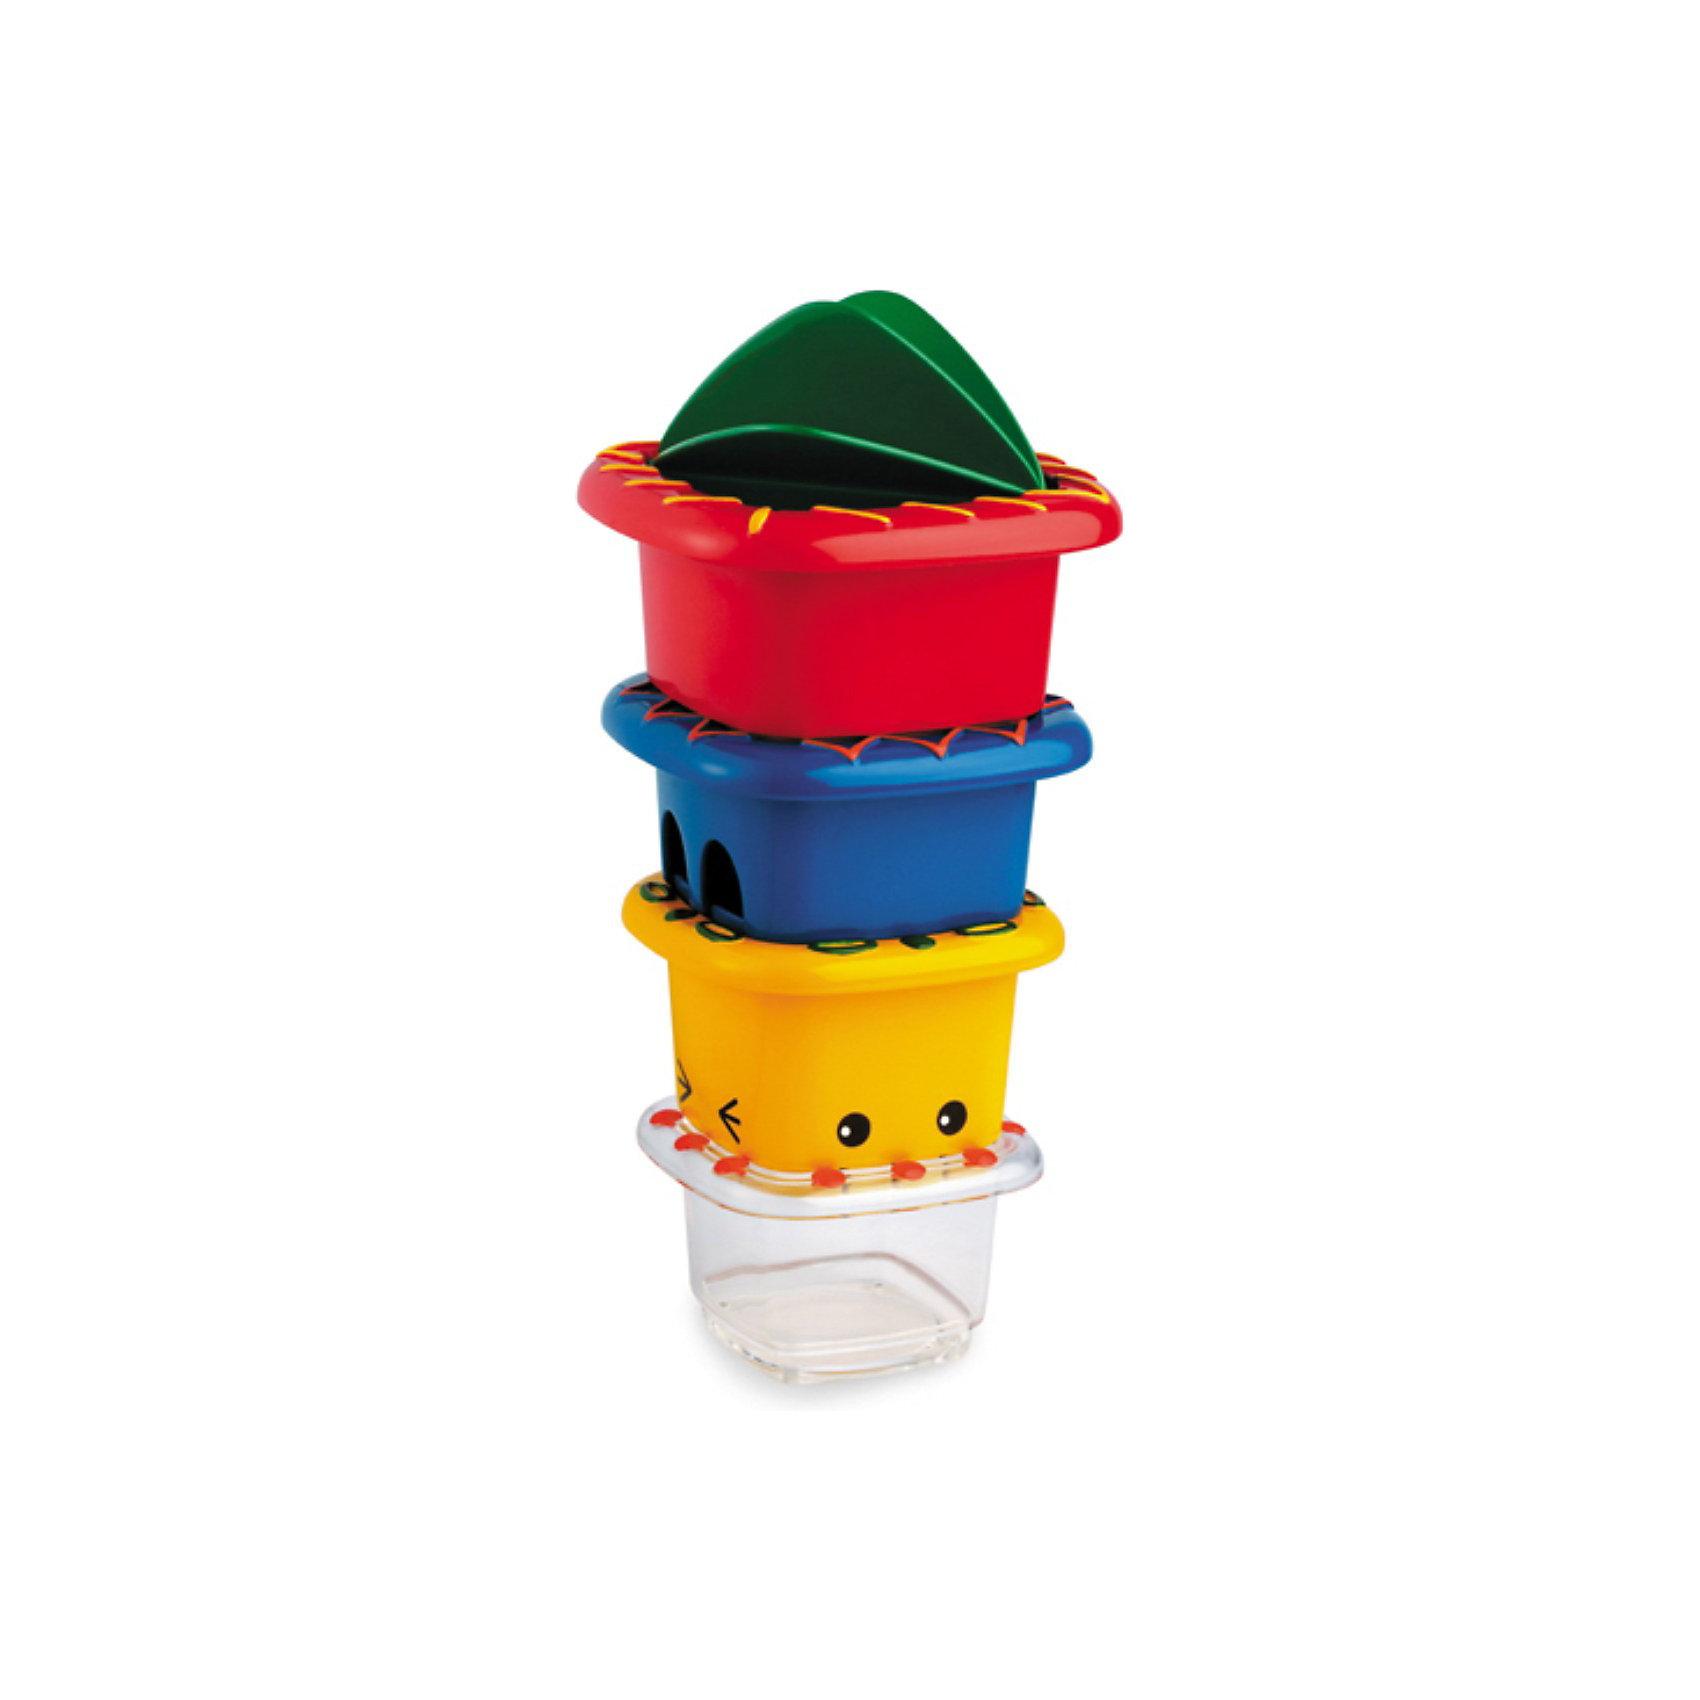 TOLO Набор ведерок, TOLO CLASSIC игрушки для ванны tolo toys набор ведерок квадратные